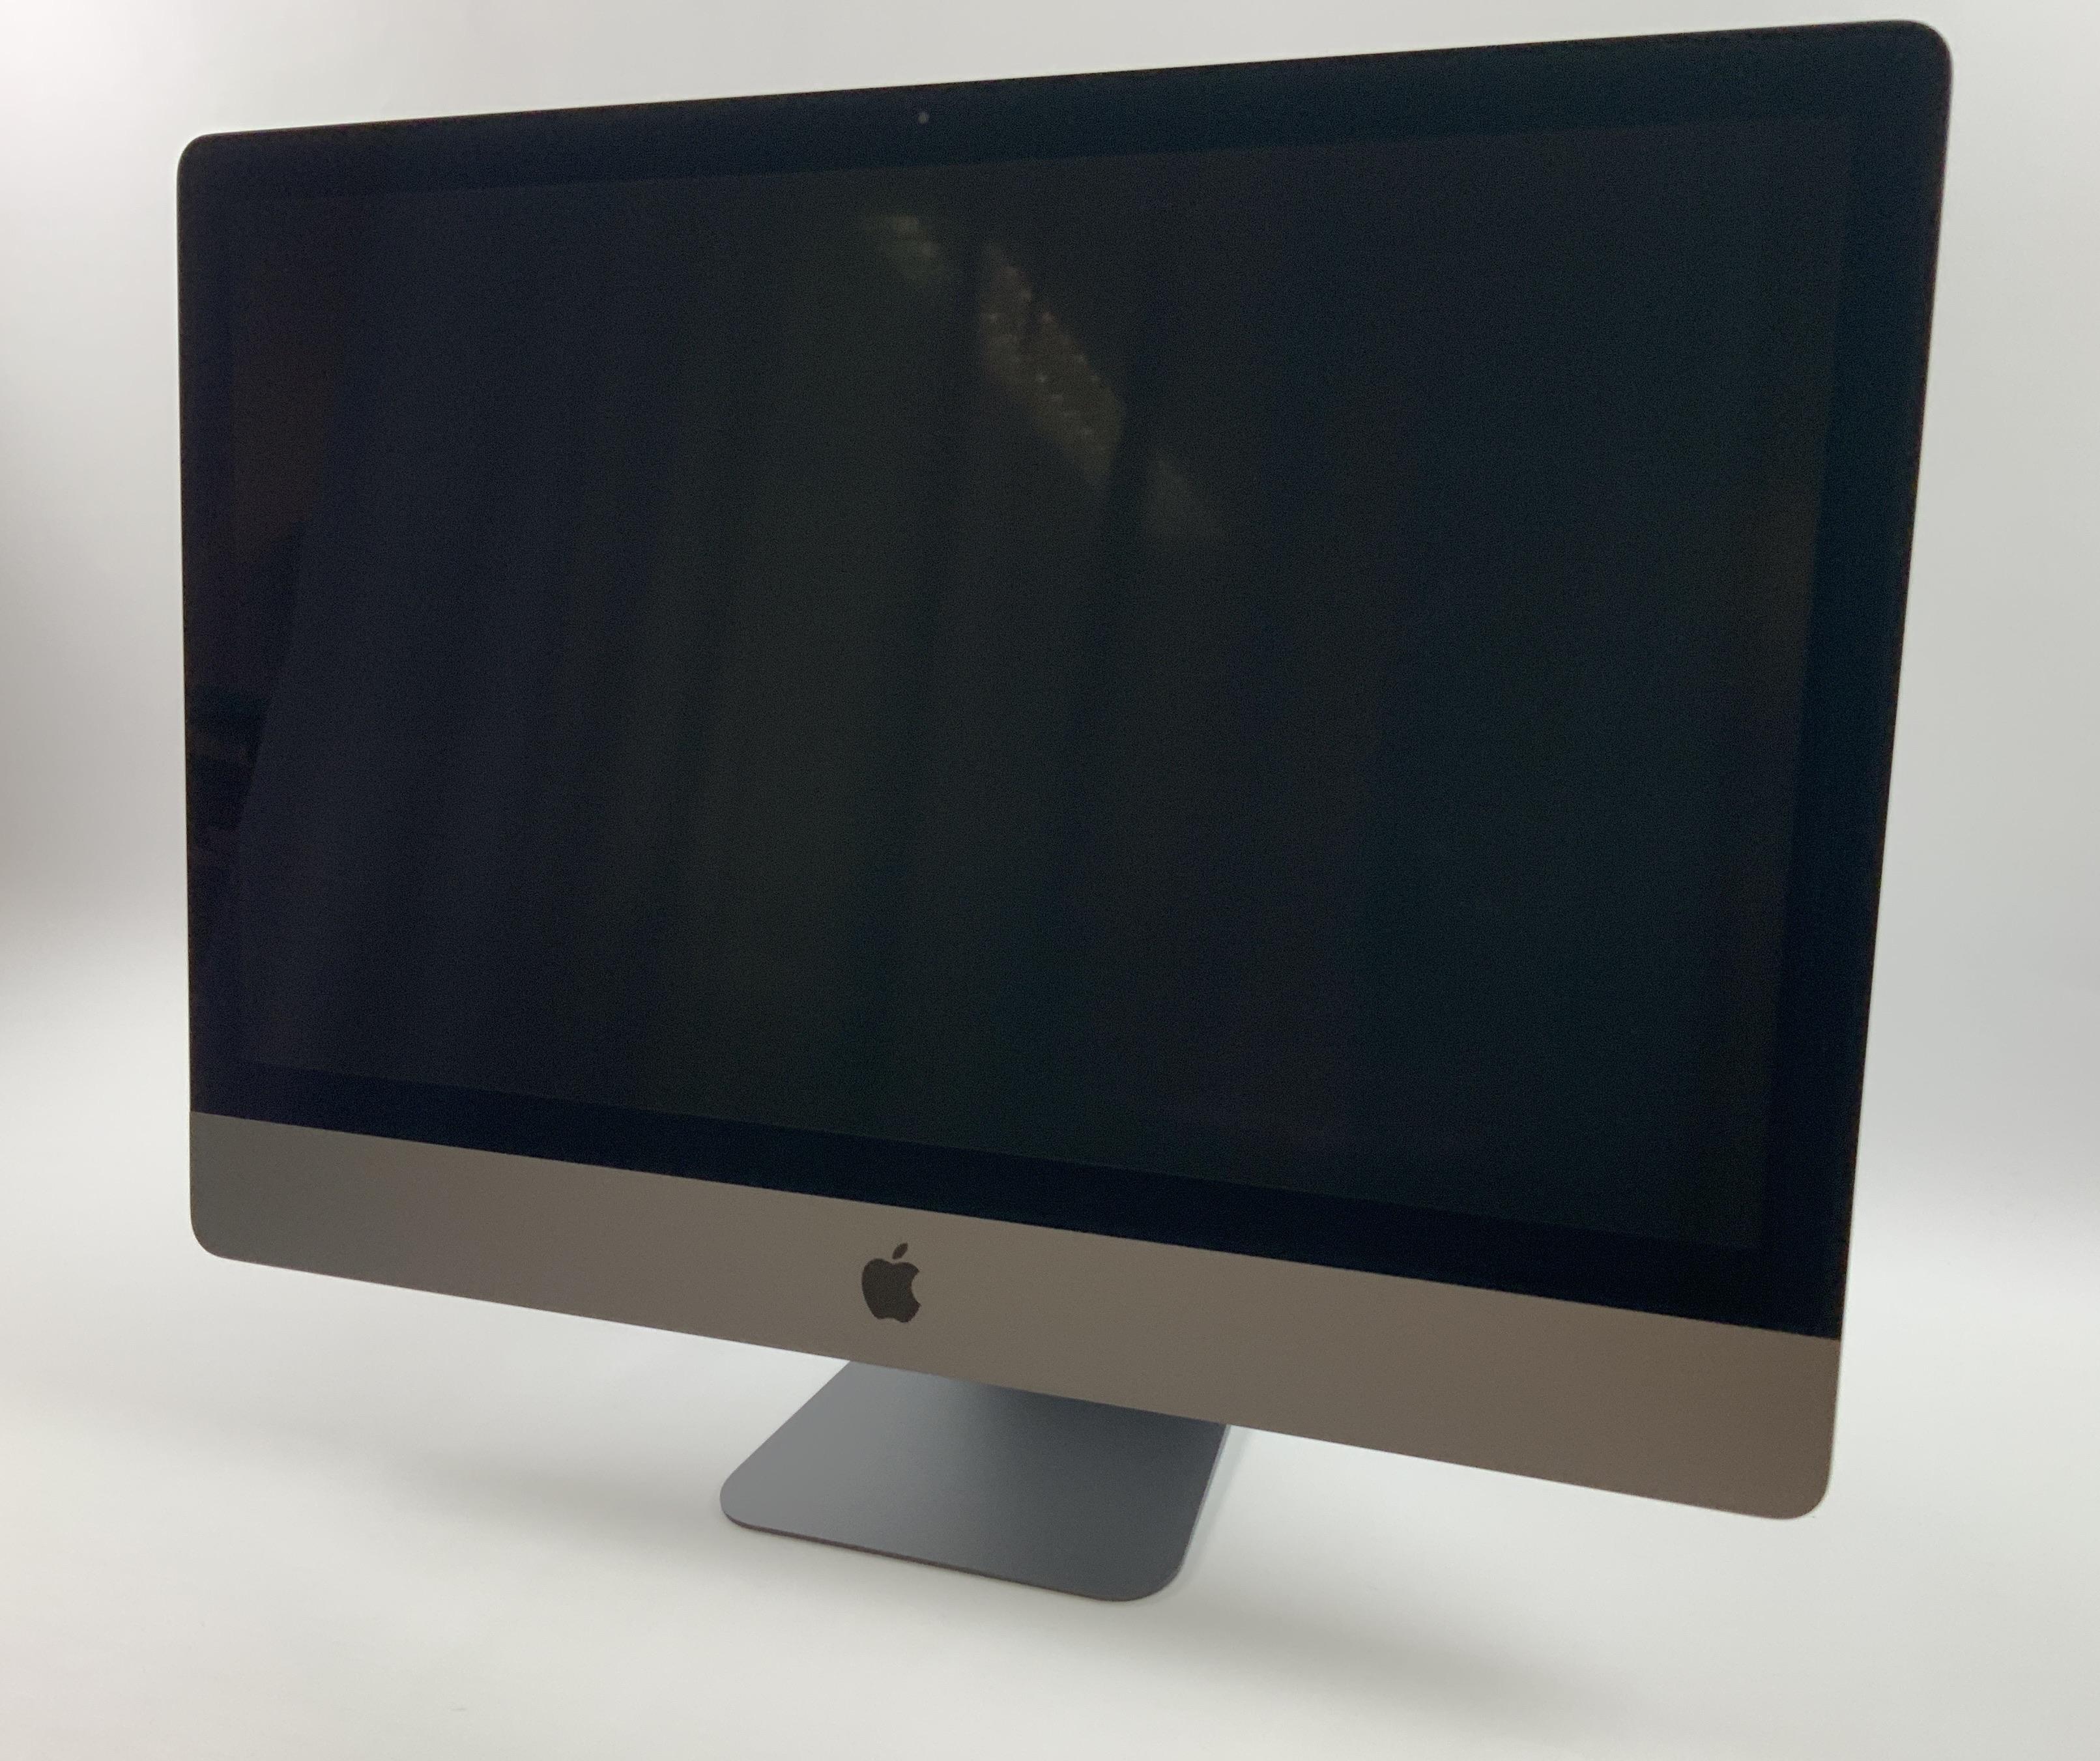 iMac Pro 2017 (Intel 8-Core Xeon W 3.2 GHz 256 GB RAM 1 TB SSD), Intel 8-Core Xeon W 3.2 GHz, 256 GB RAM, 1 TB SSD, Kuva 1